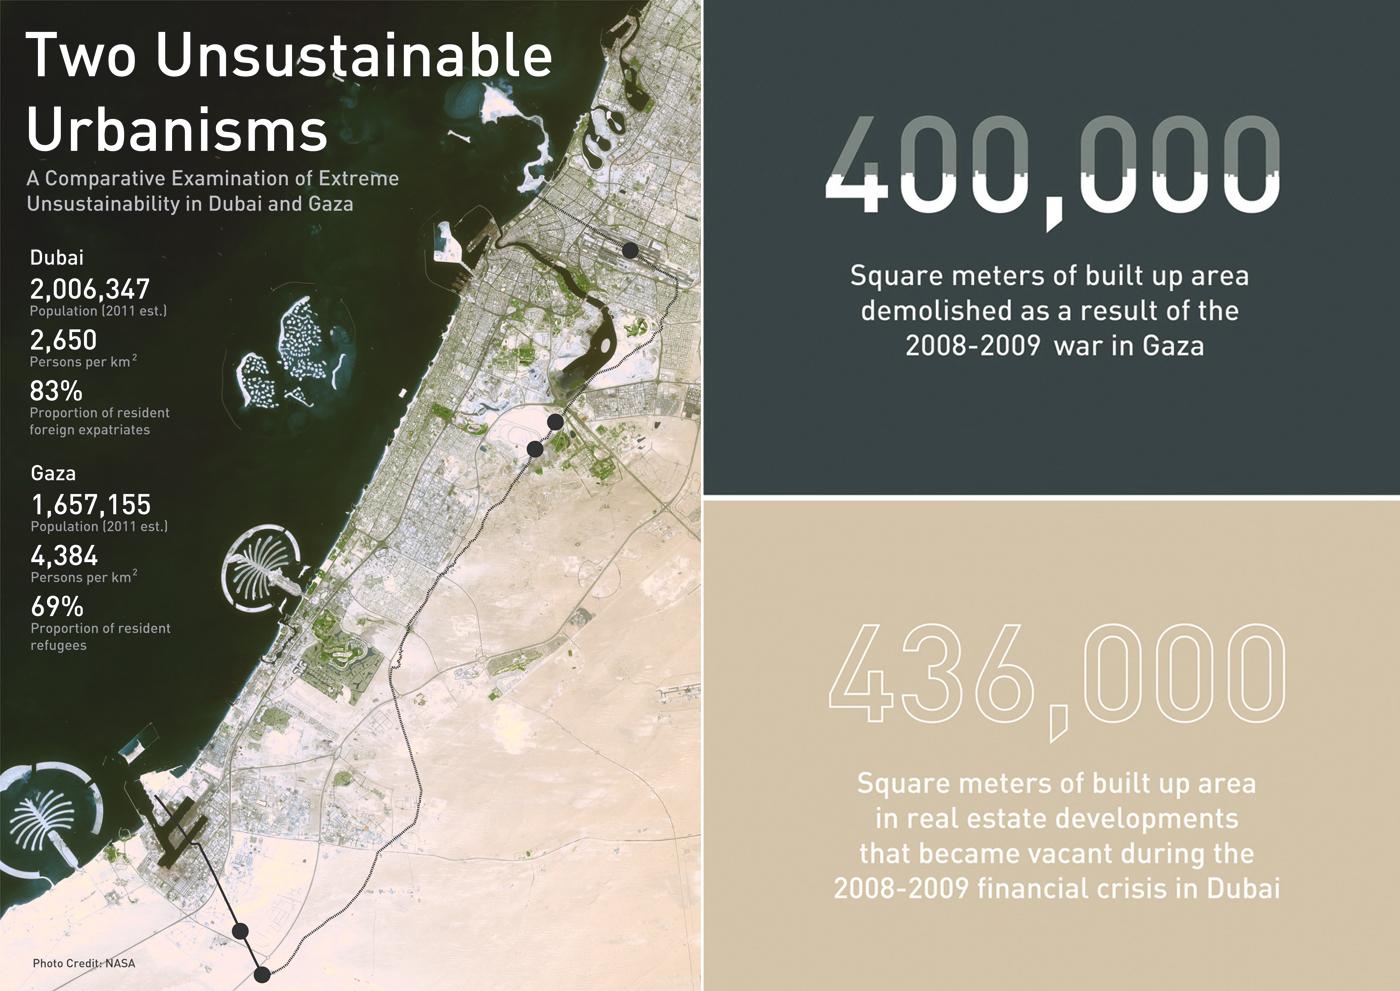 Two Unsustainable Urbanisms: Dubai and Gaza | Carboun